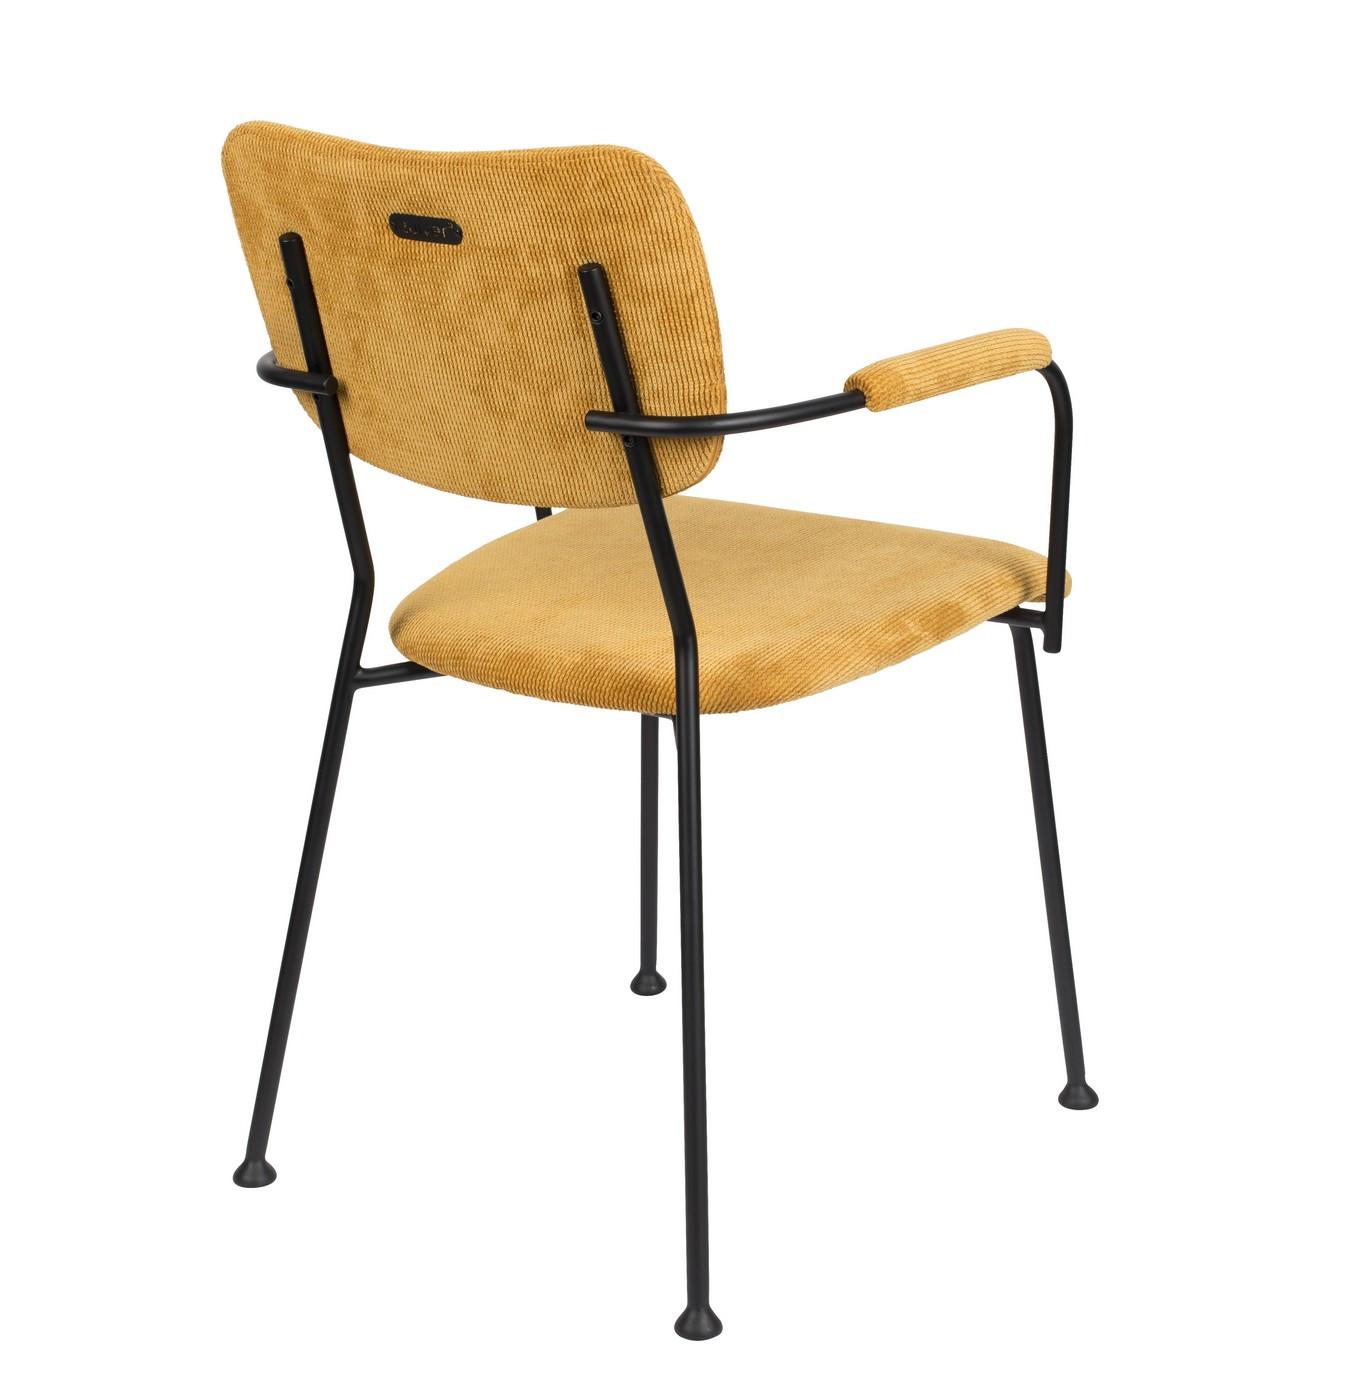 Chaise accoudoirs velours jaune